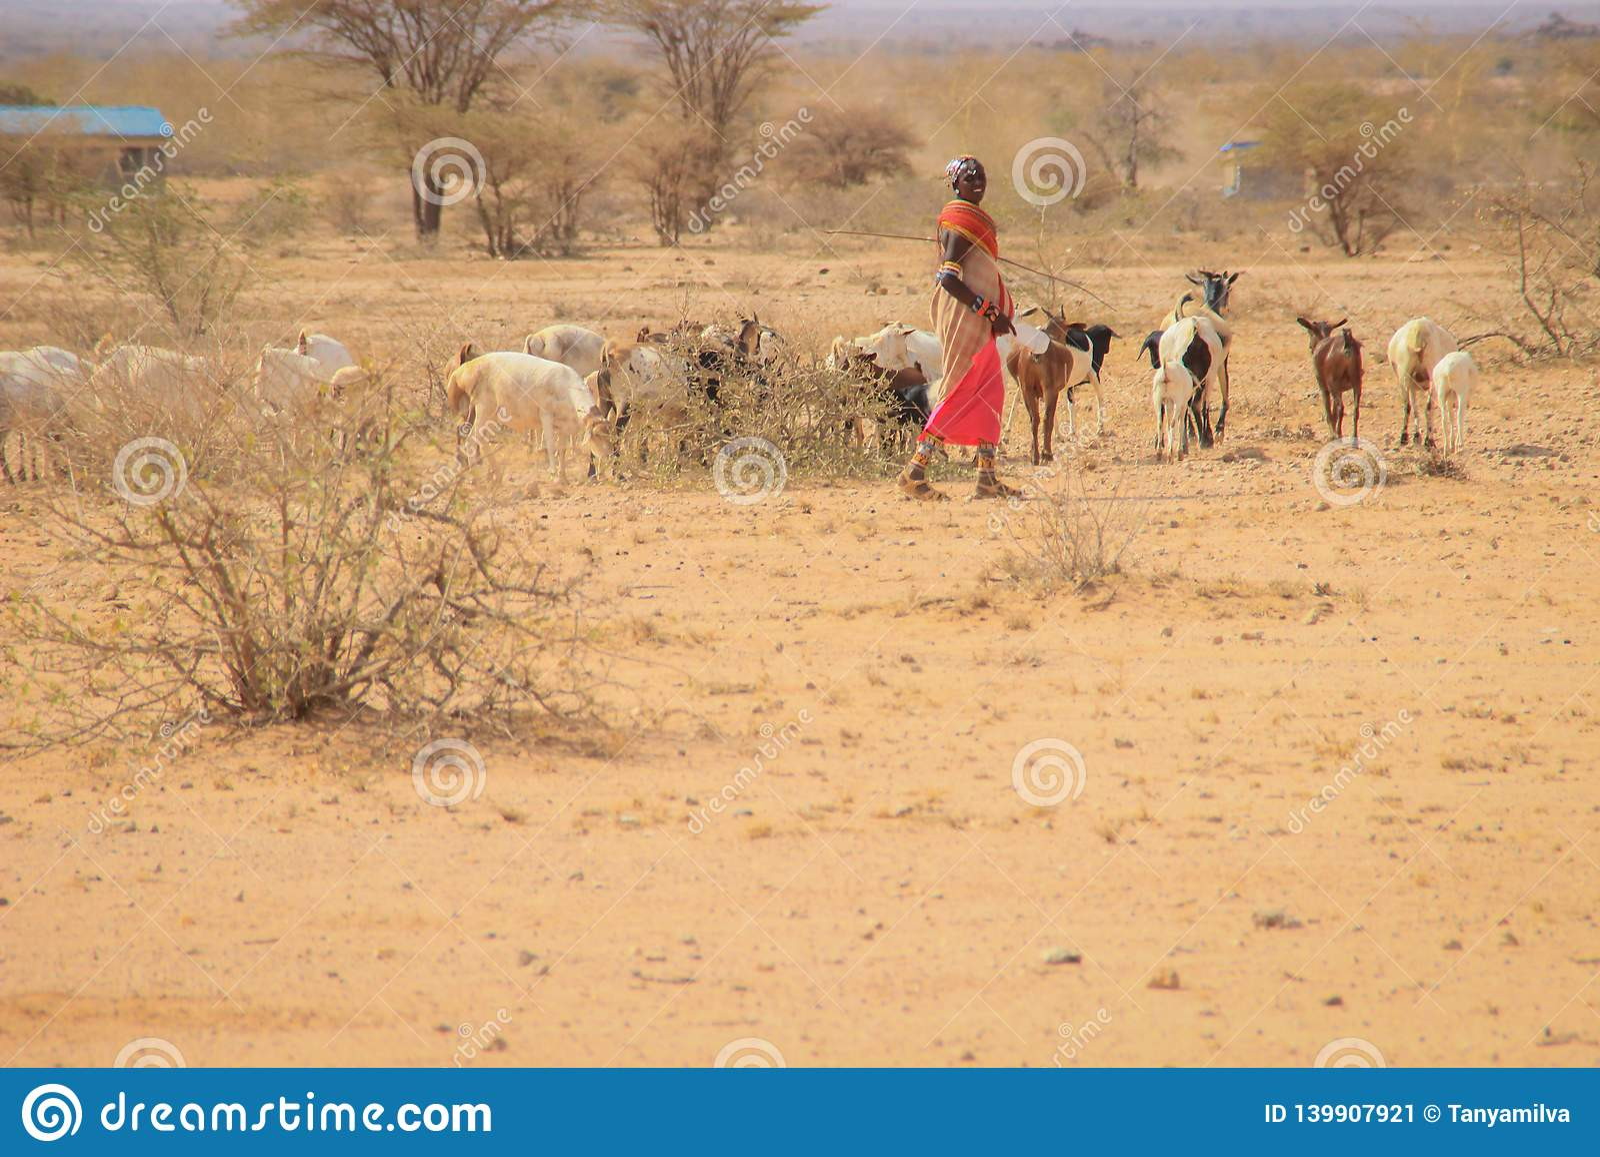 African female shepherd from the Samburu tribe a related Masai tribe in a national costume herding a flock of goats